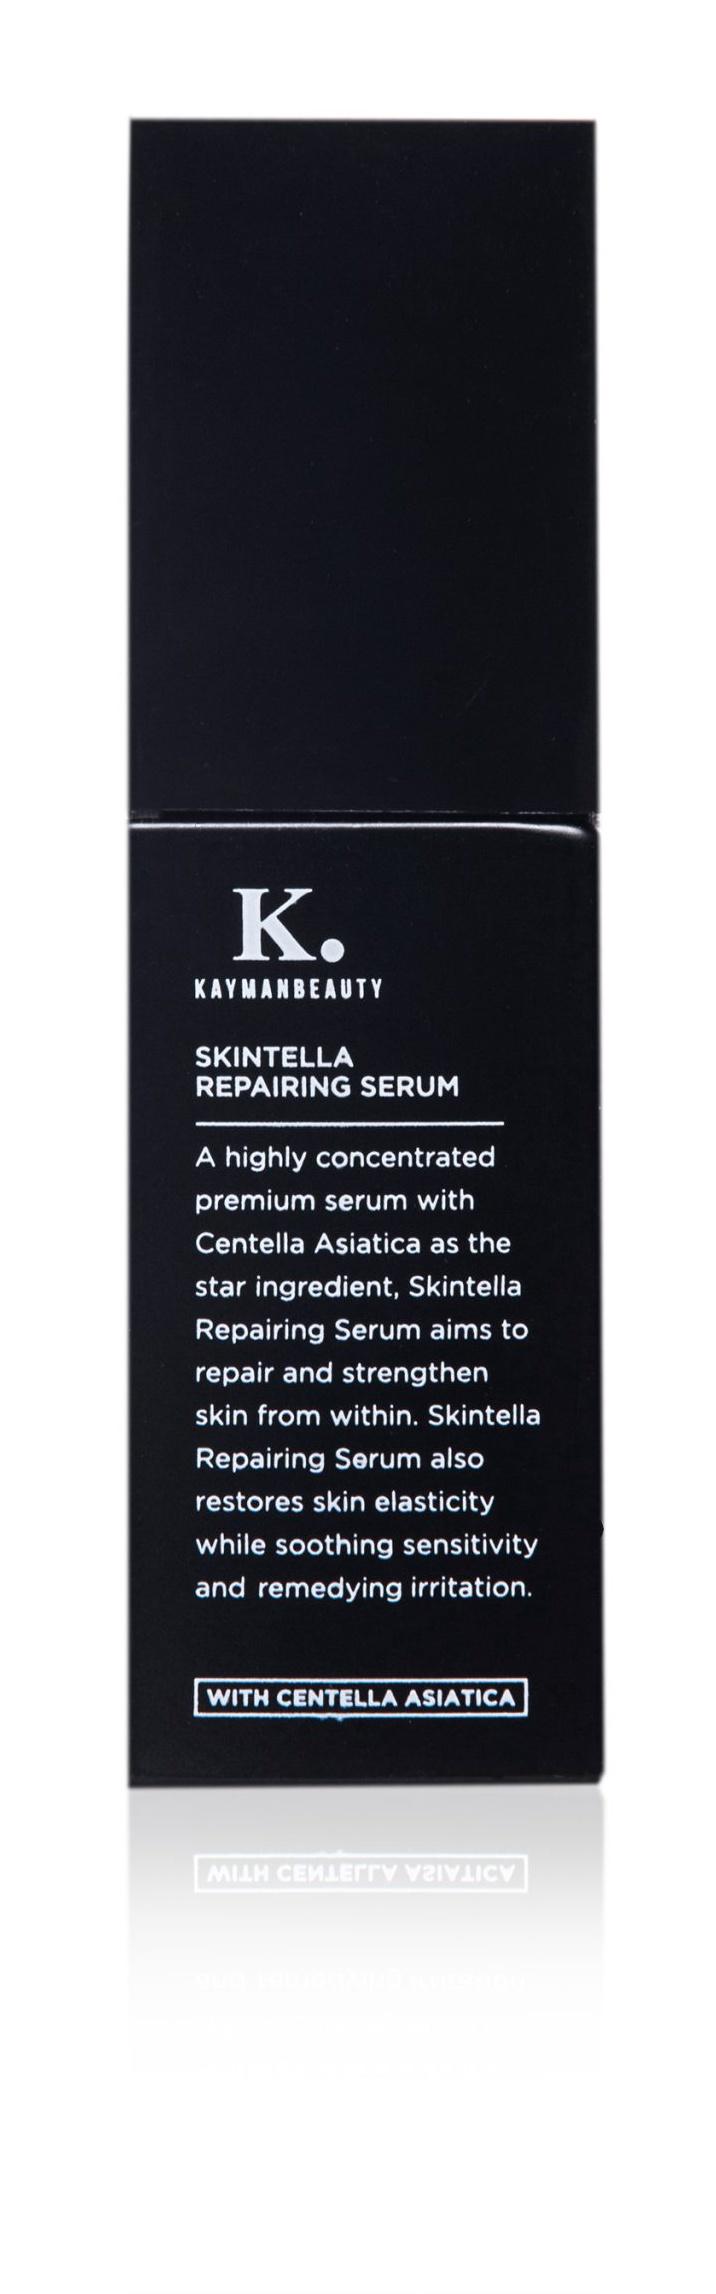 Kayman Beauty Skintella Repairing Serum